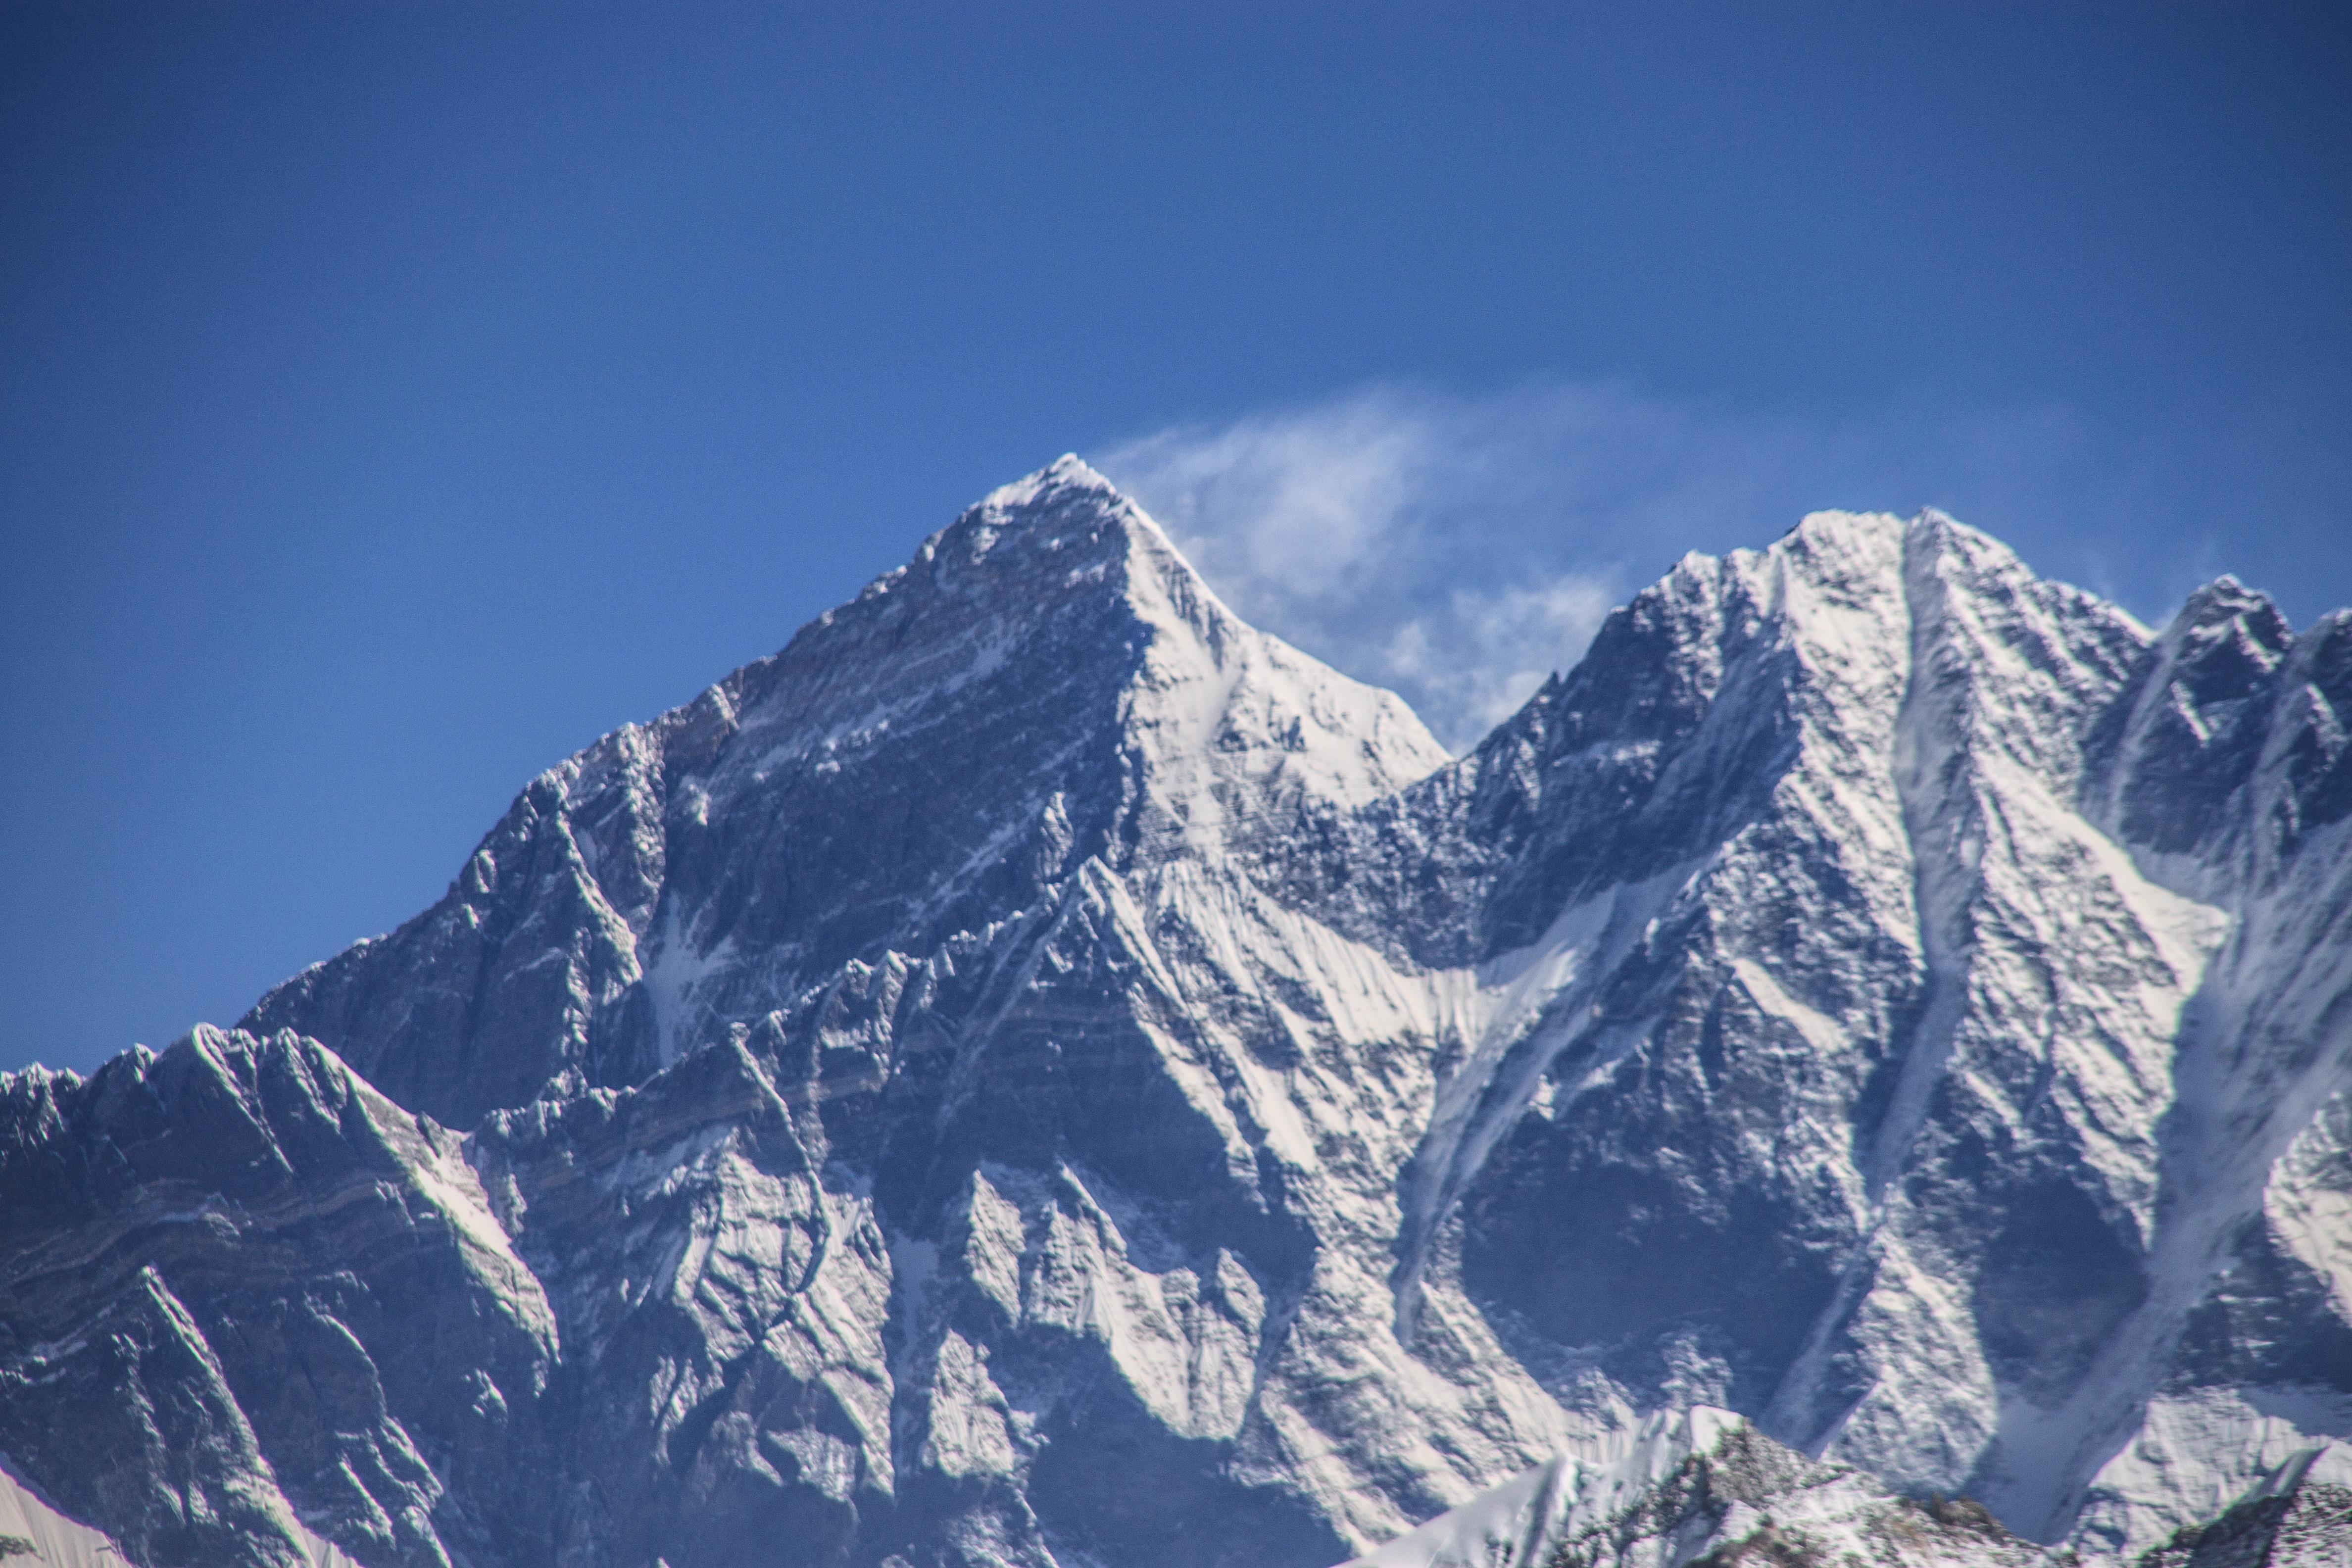 Summit of Mt Everest